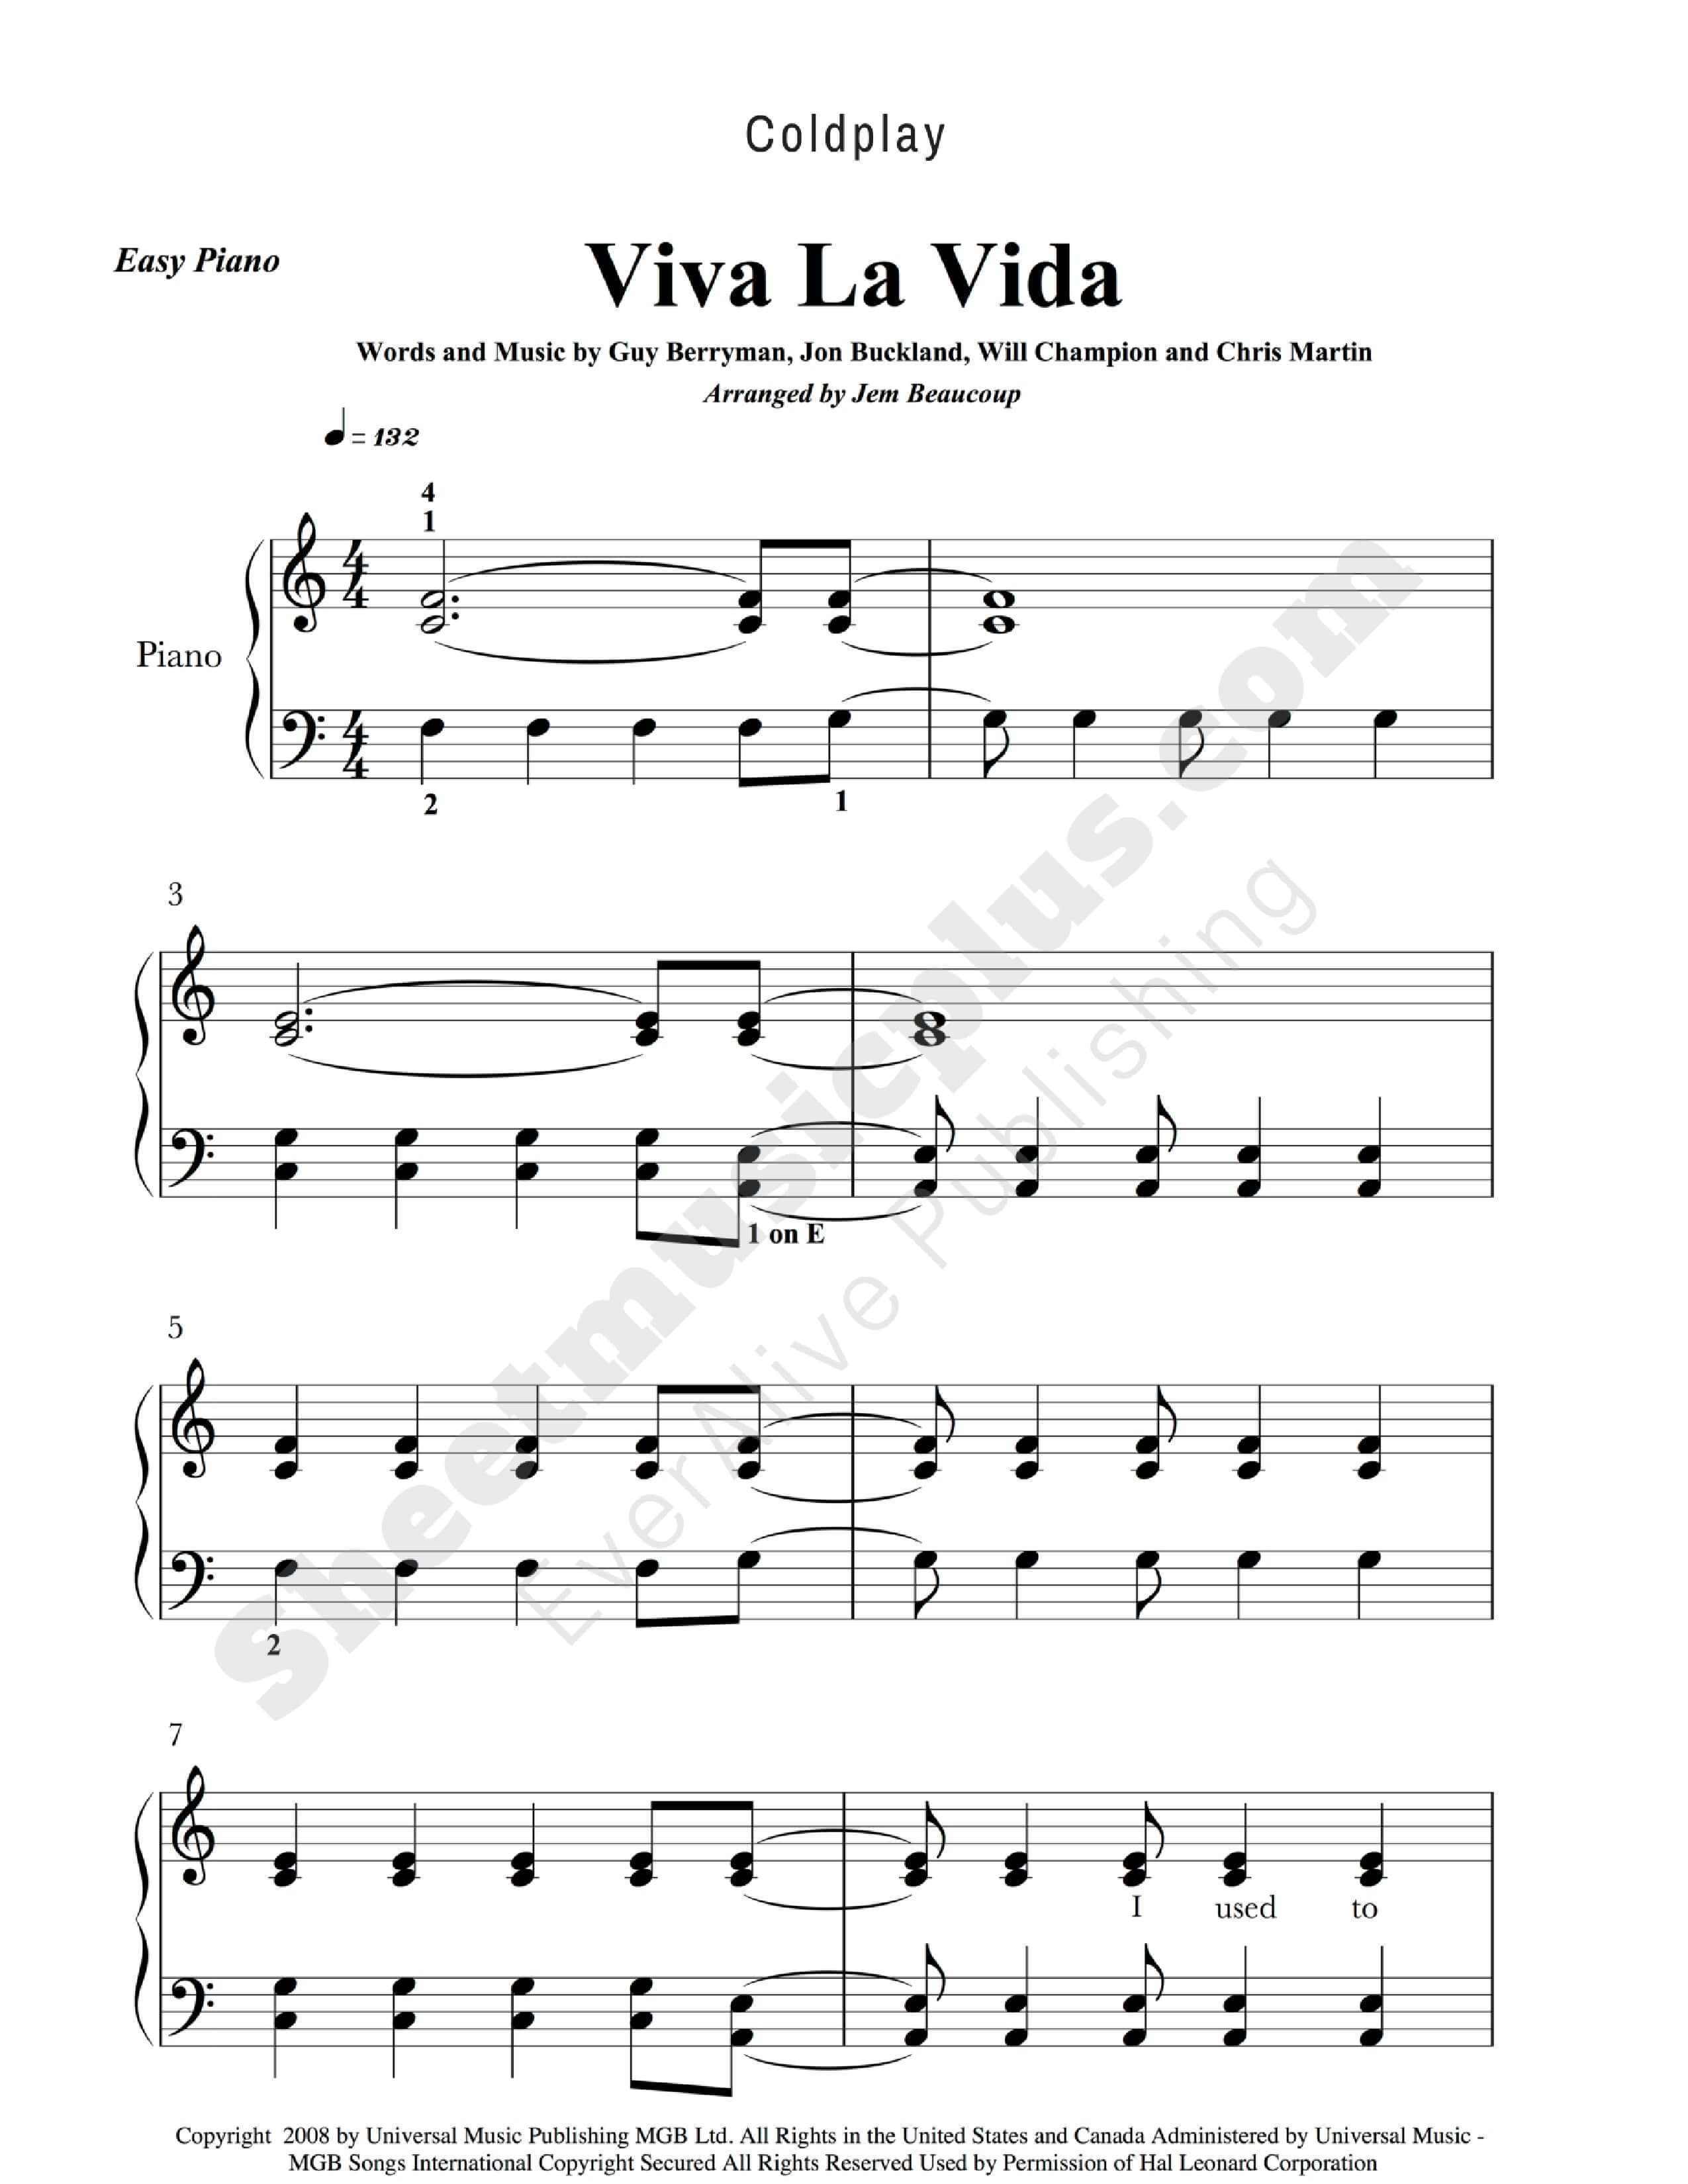 Coldplay viva la vida easy piano music download and print coldplay viva la vida easy piano music download and print coldplay easy hexwebz Choice Image